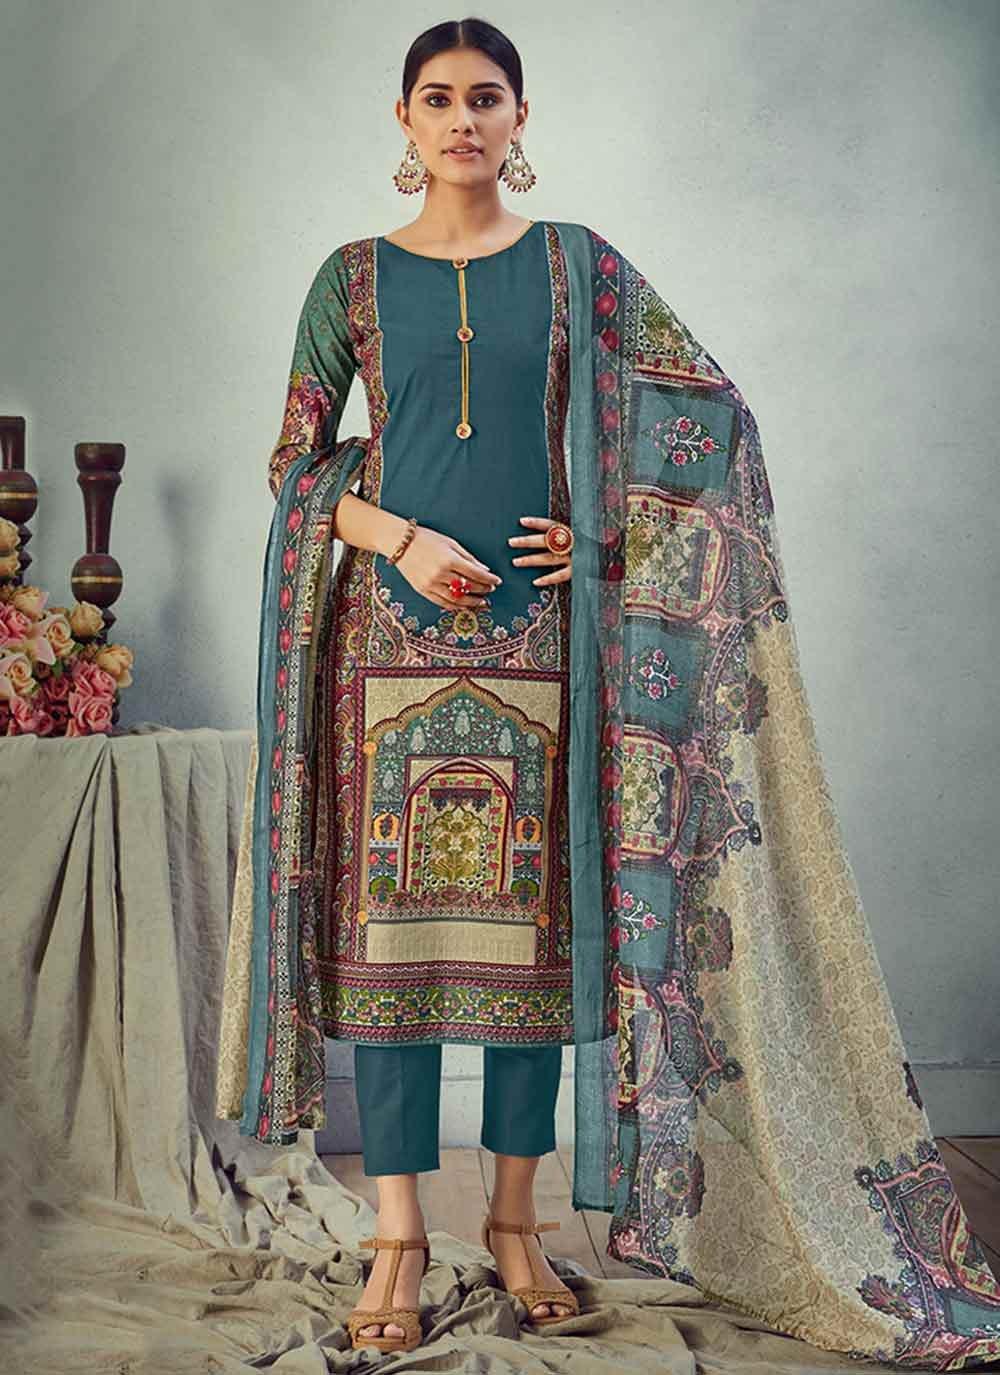 Digital Print Cotton Salwar Suit in Multi Colour